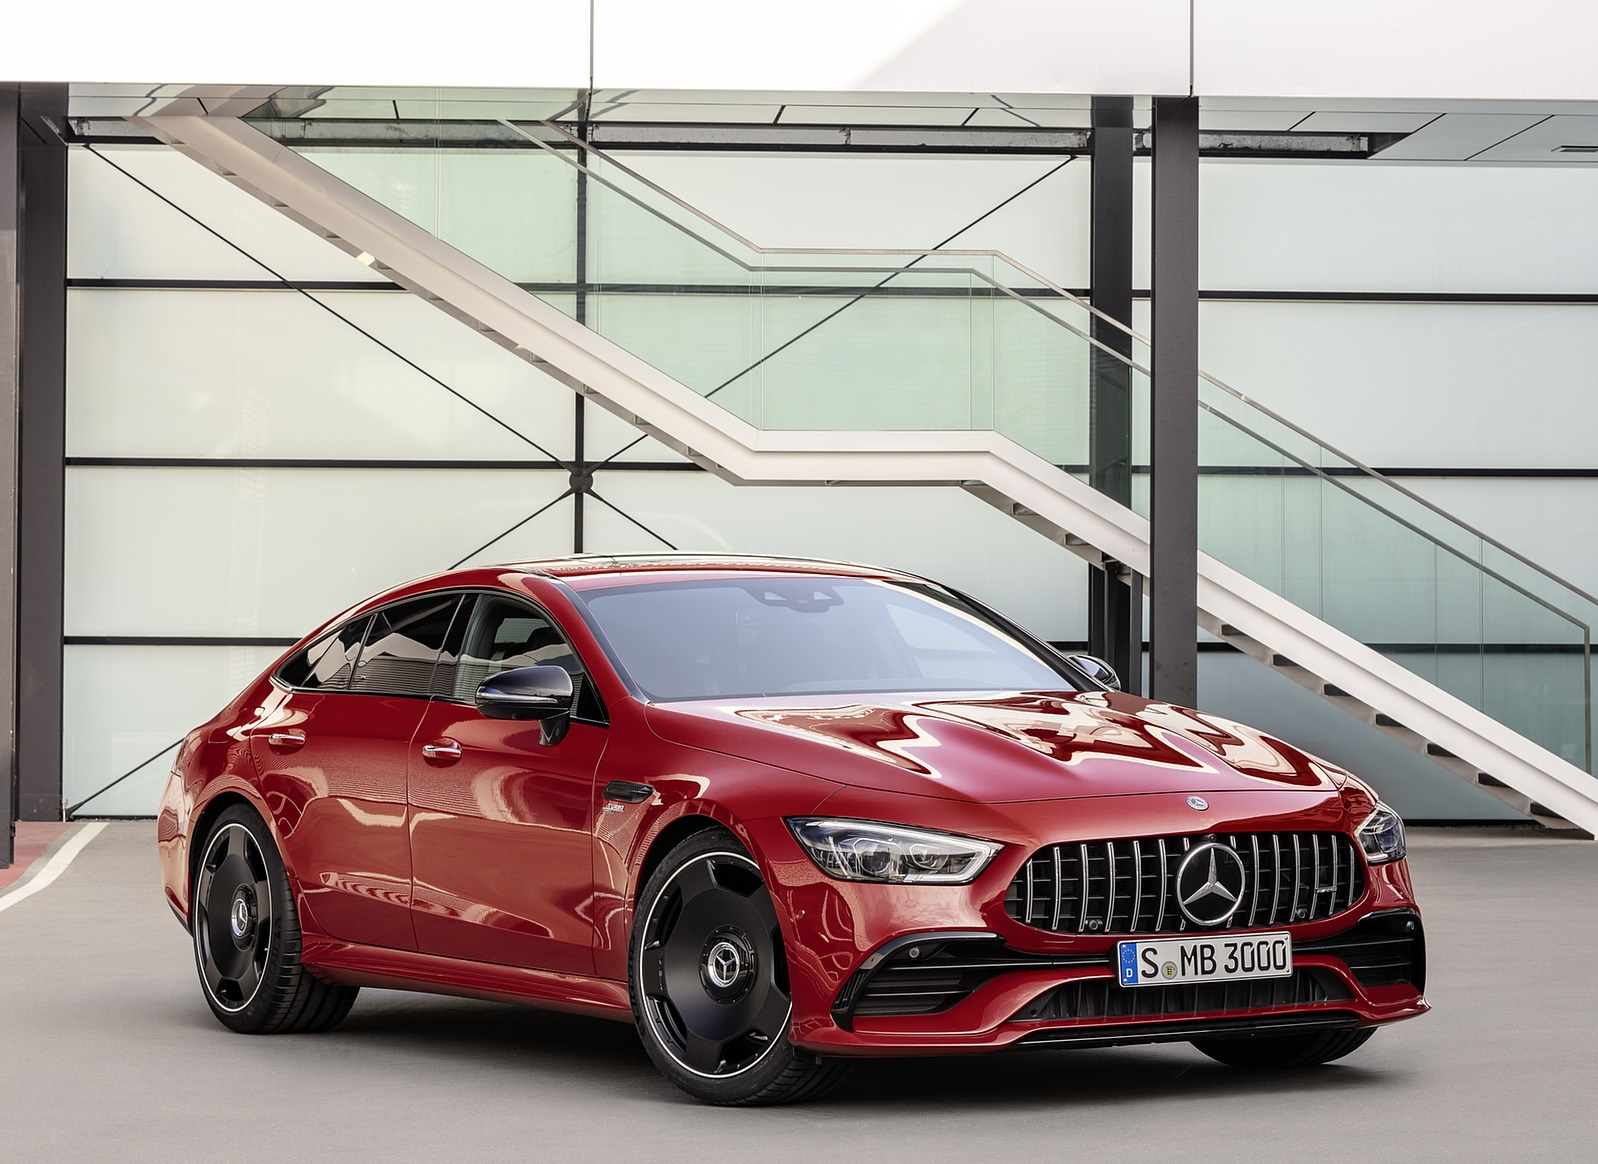 2019 Mercedes-AMG GT 43 4MATIC+ 4-Door Coupé (Color: Jupiter Red) Front Three-Quarter Wallpapers (4)